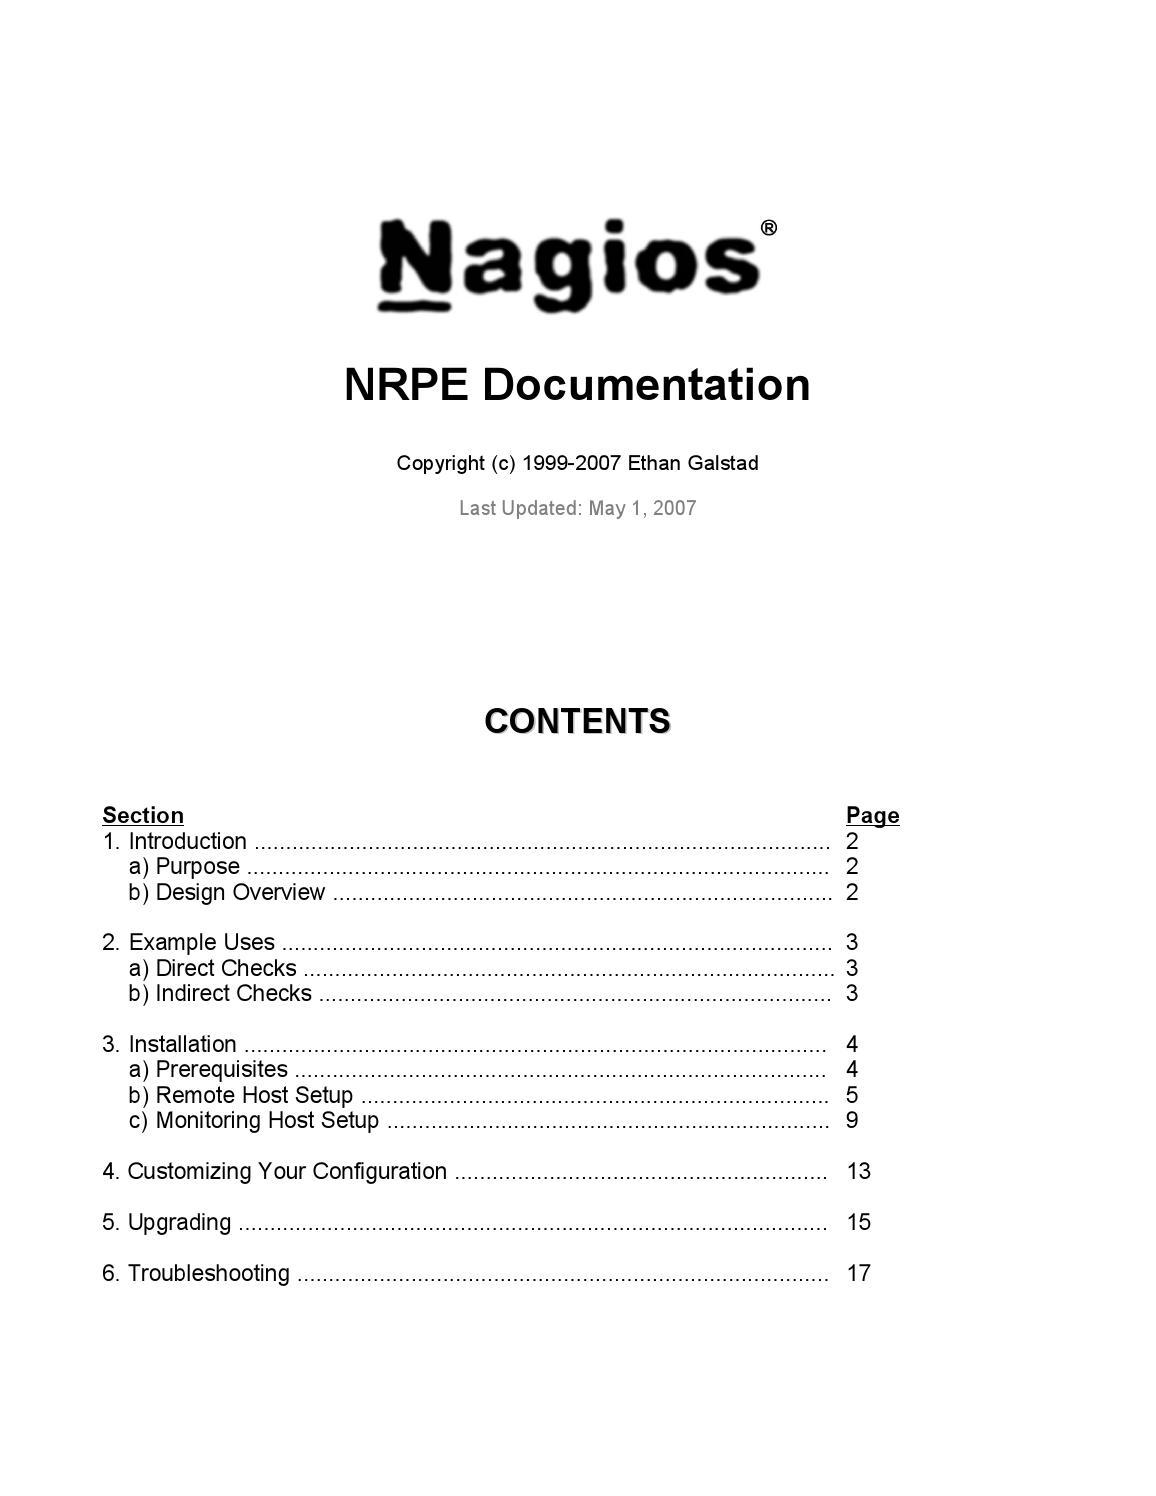 NRPE - Nagios Remote Plugin Executor by Marc Trimble - issuu